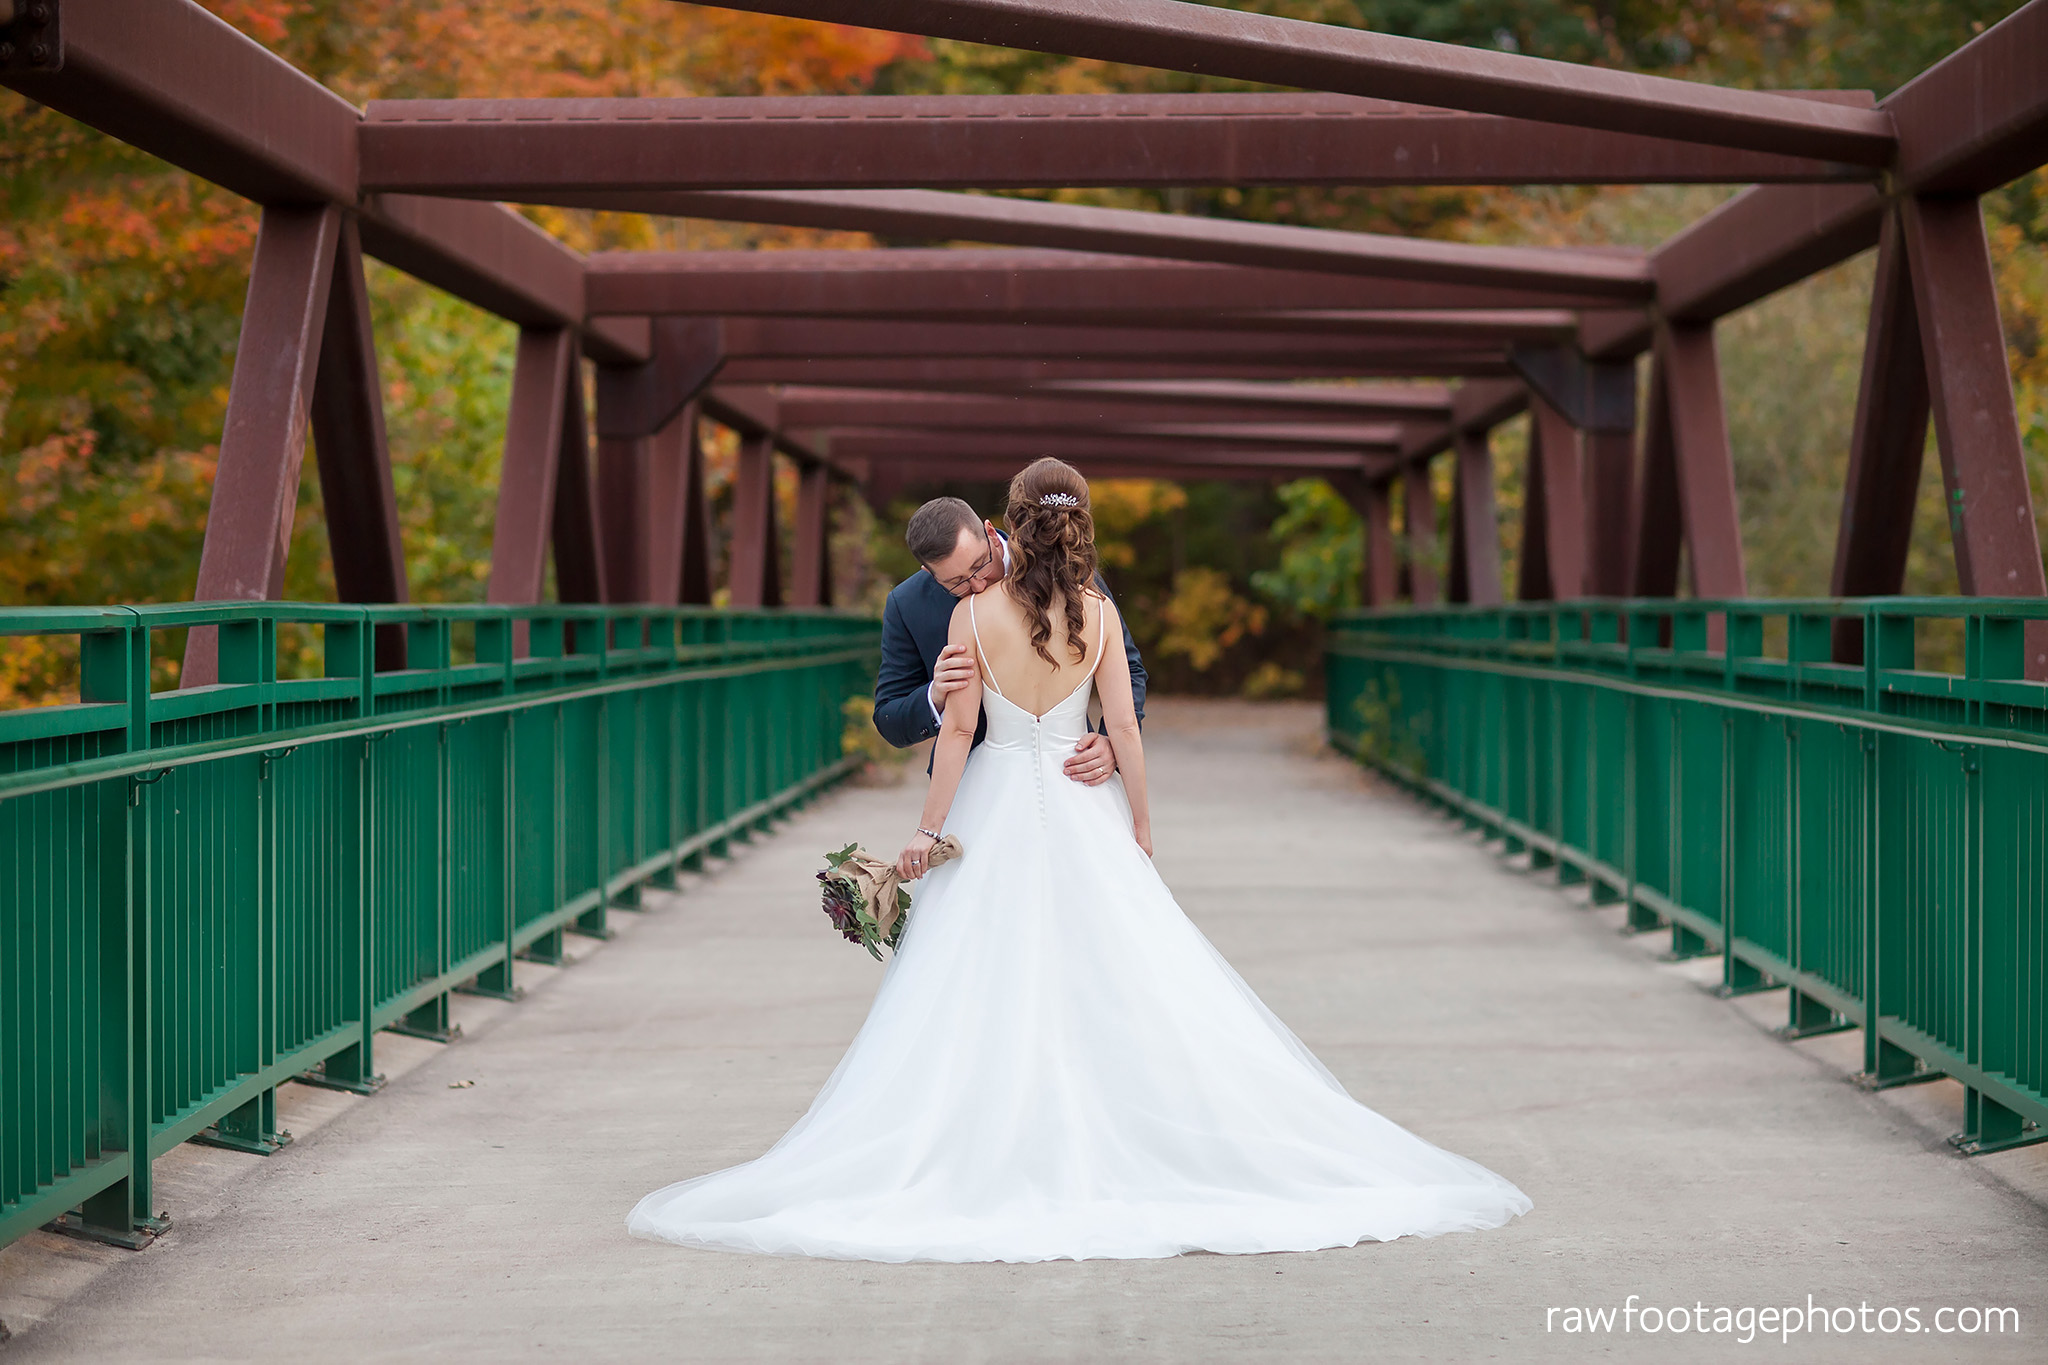 london_ontario_wedding_photographer-civic_gardens-springbank_park-succulent_bouquet-fall_wedding-bridge-raw_footage_photography076.jpg